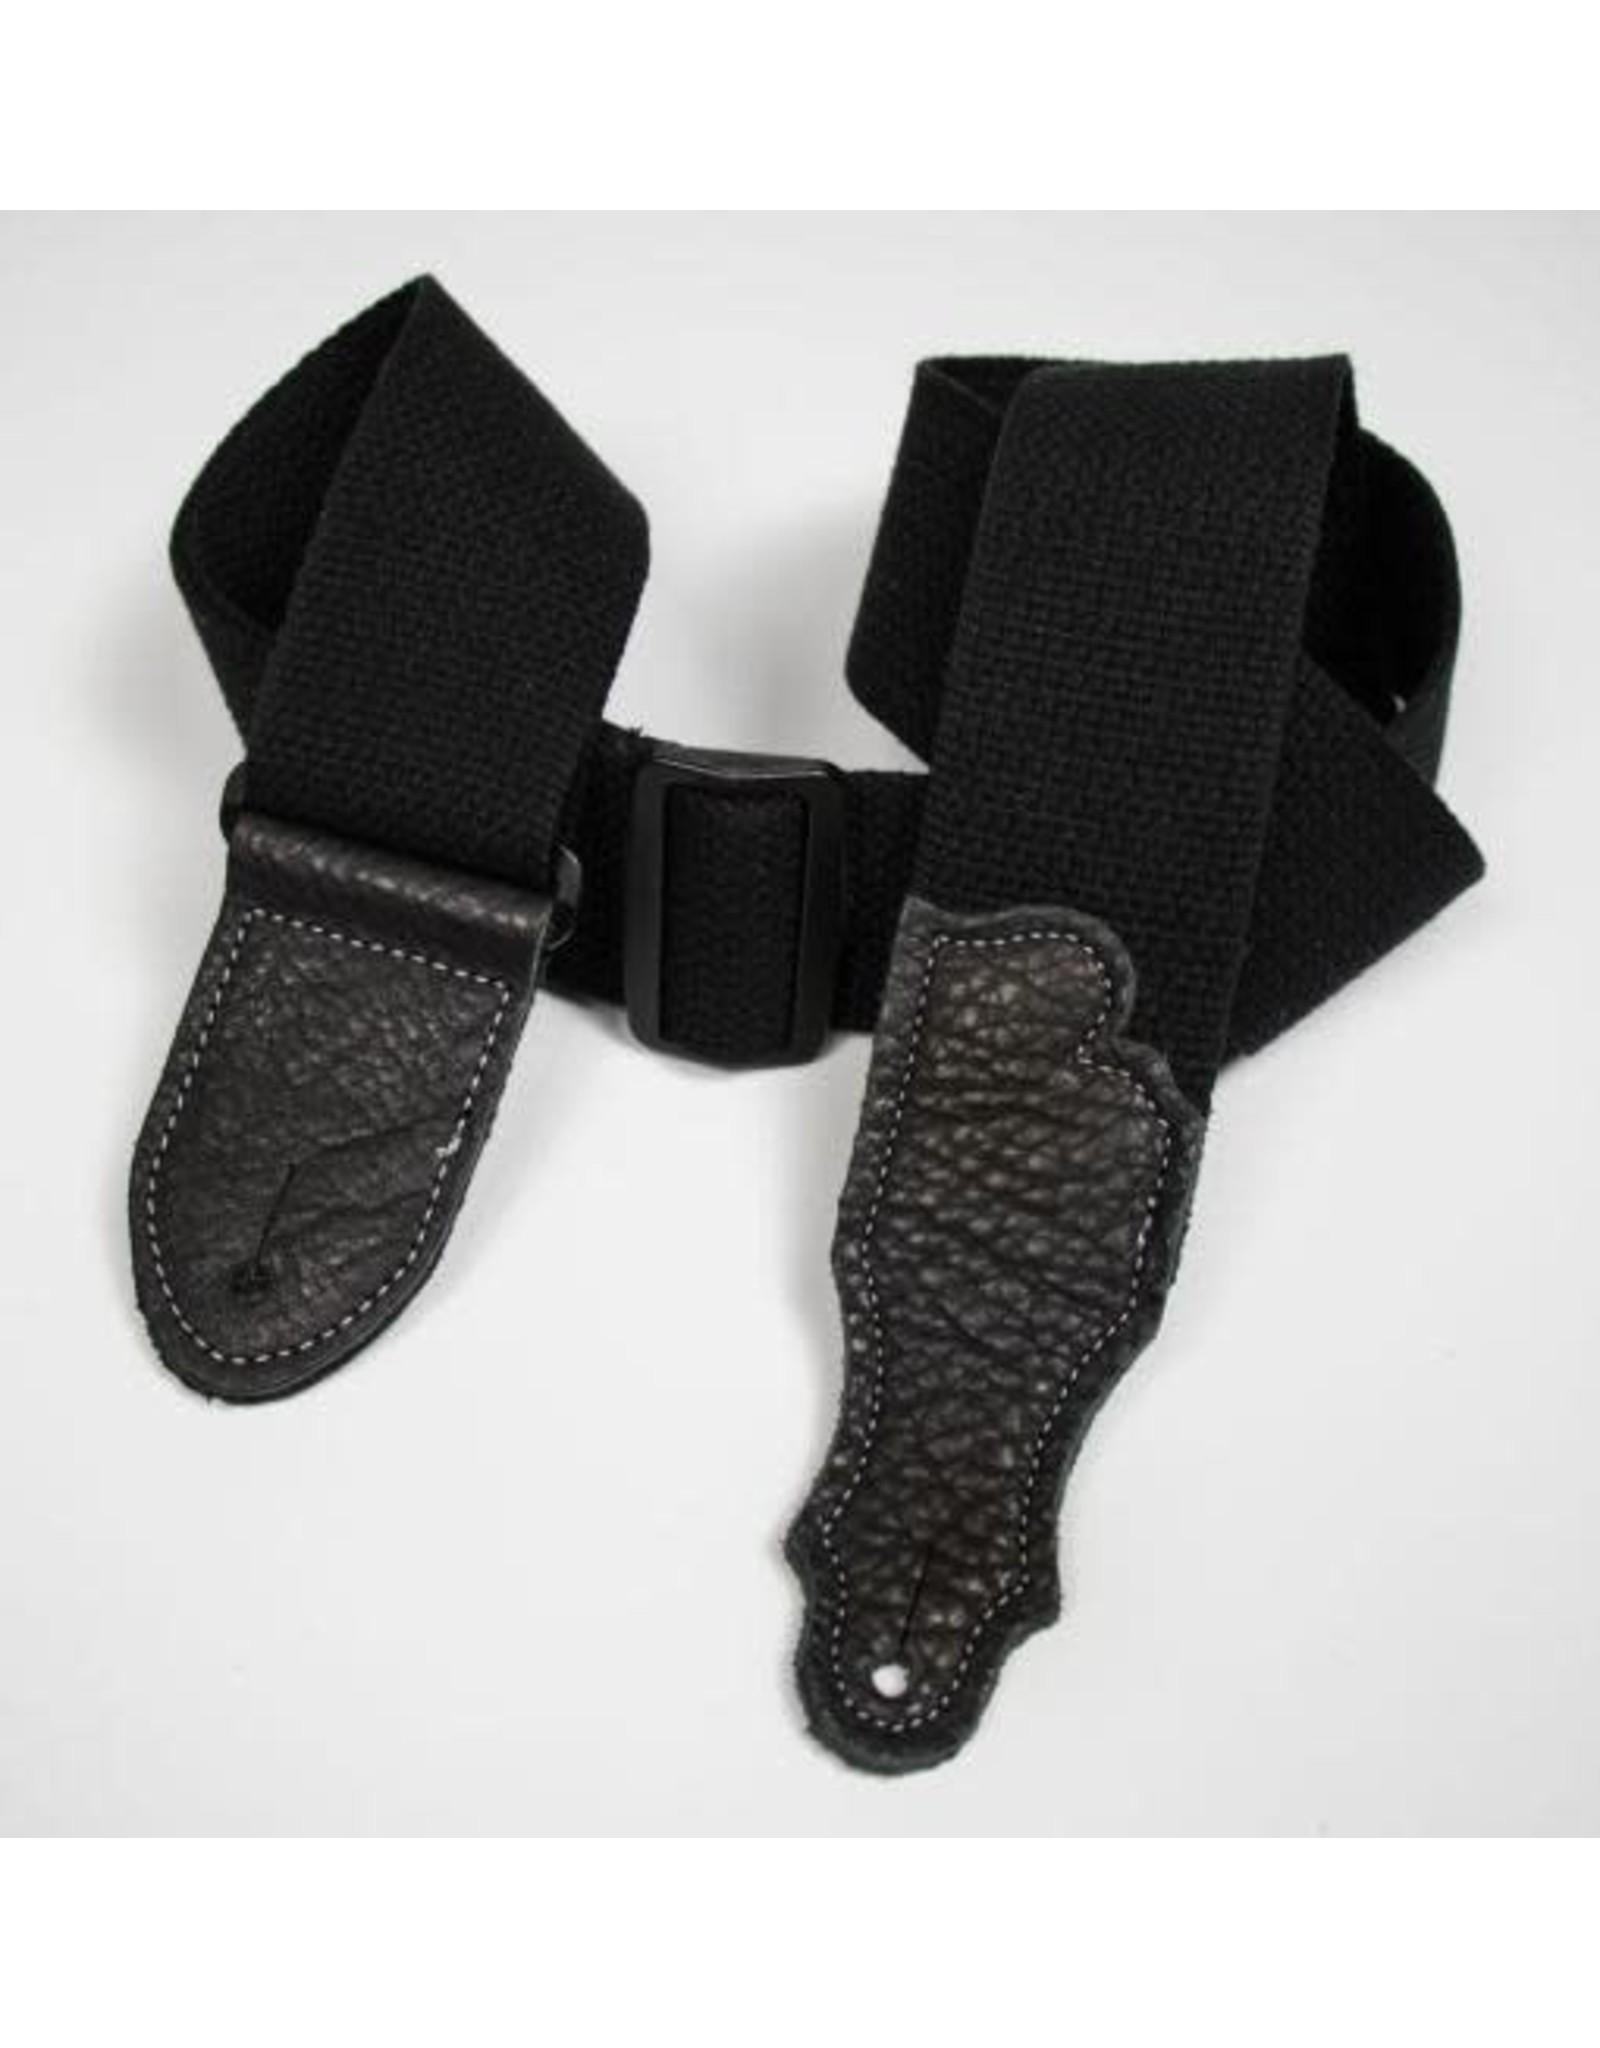 "Franklin Franklin 2"" Cotton Guitar Strap – Glove Leather End Tab Black"